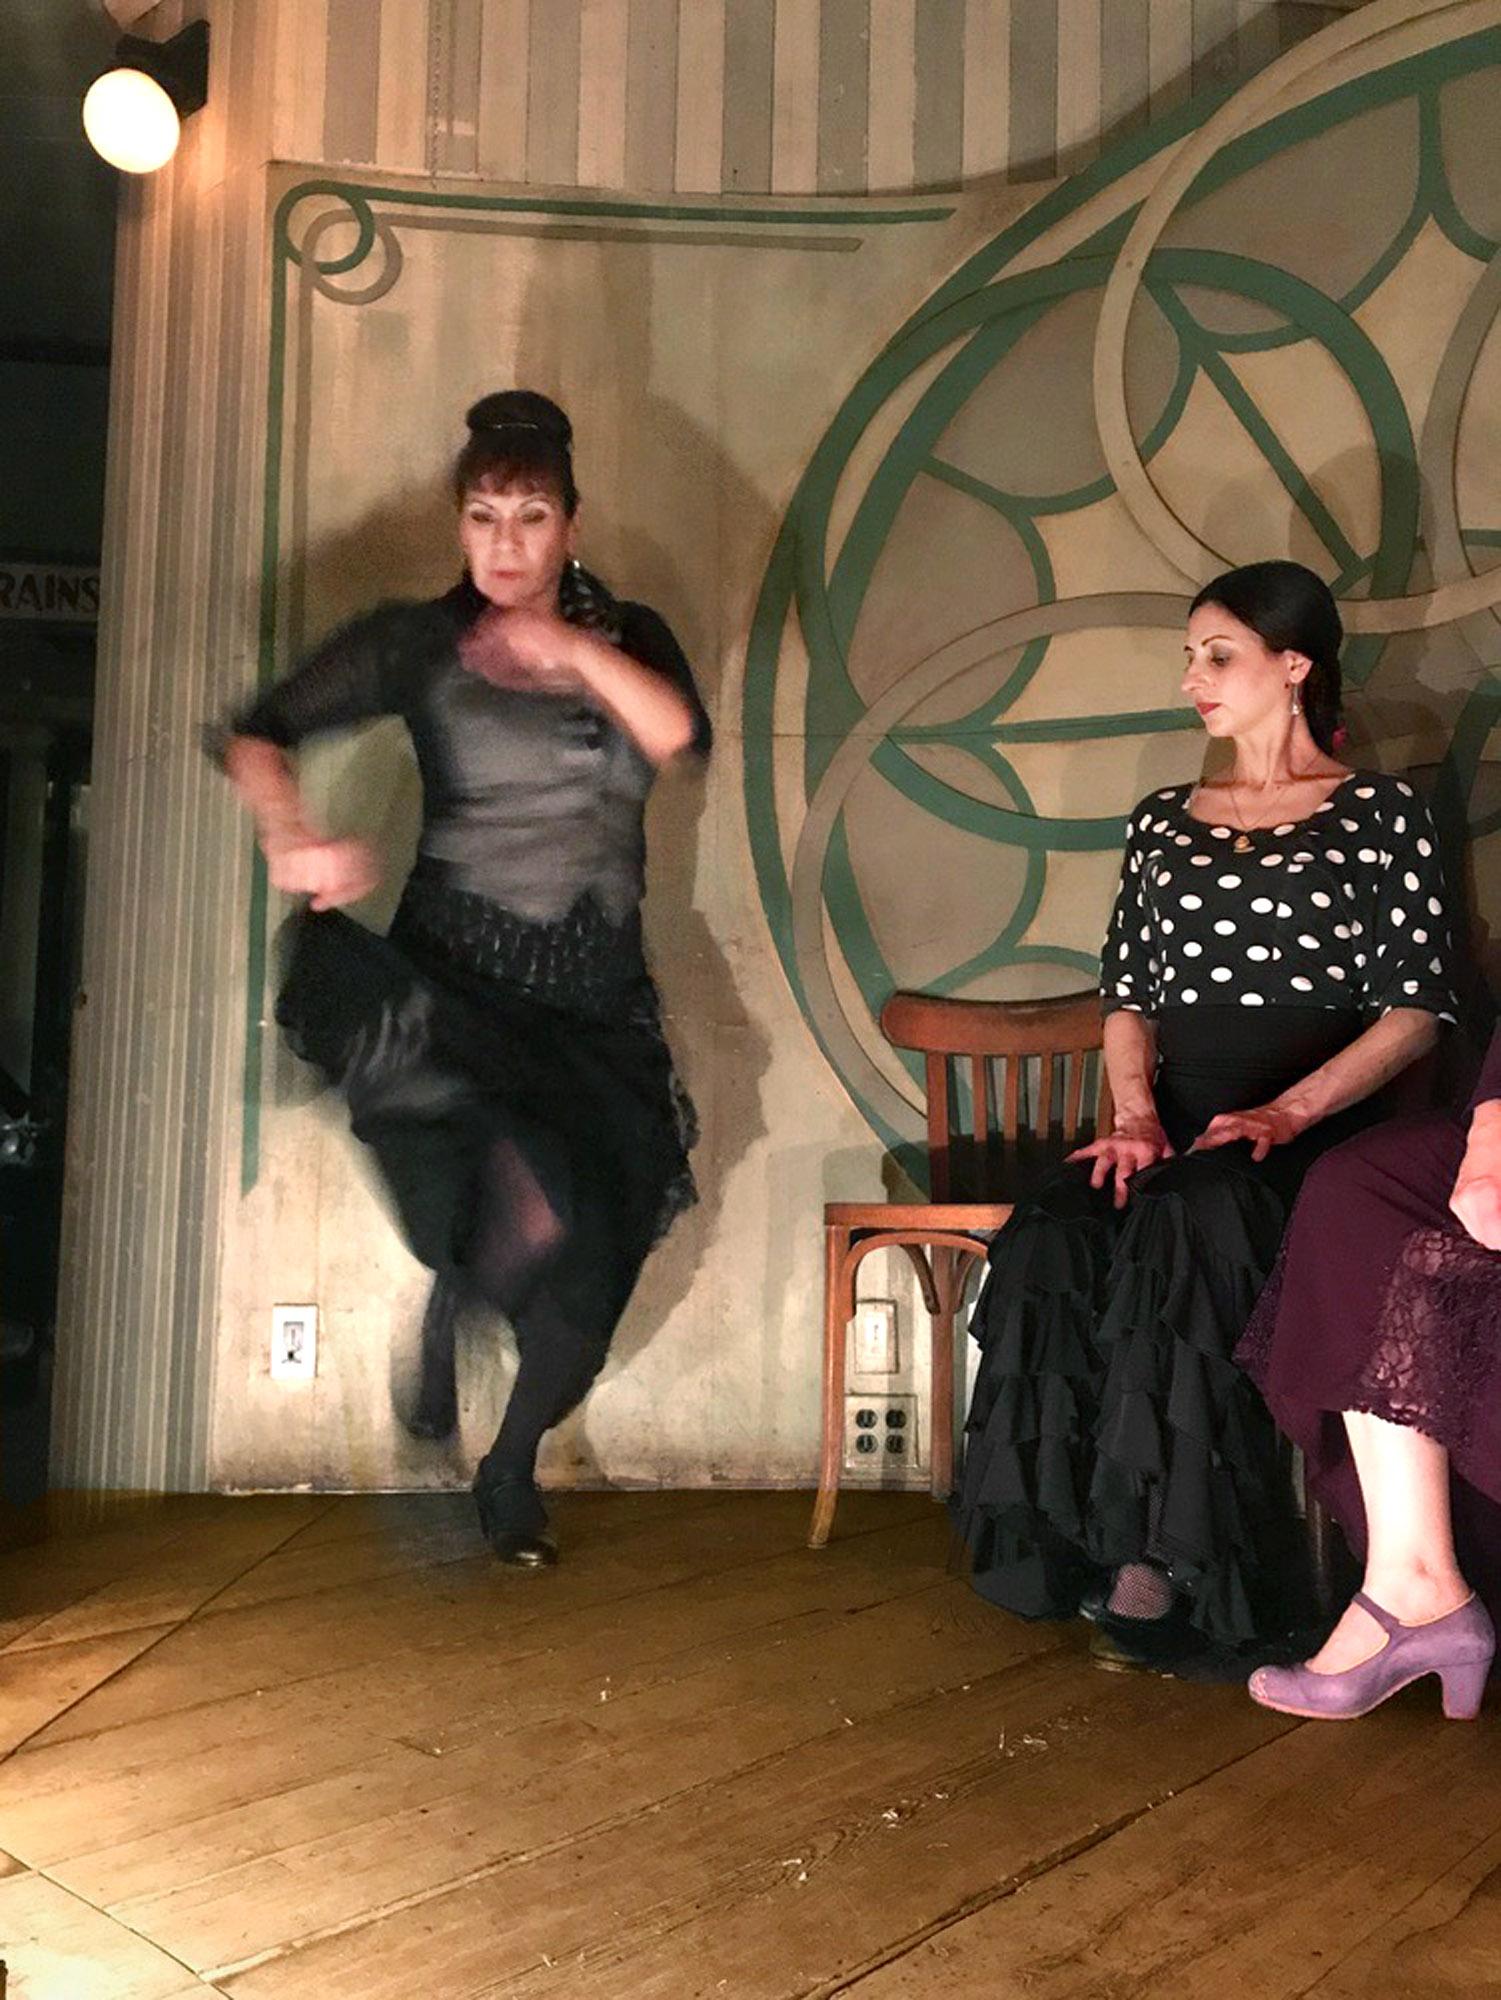 La Conja Flamenco at St. Mazie Bar & Supper Club, Williamsburg